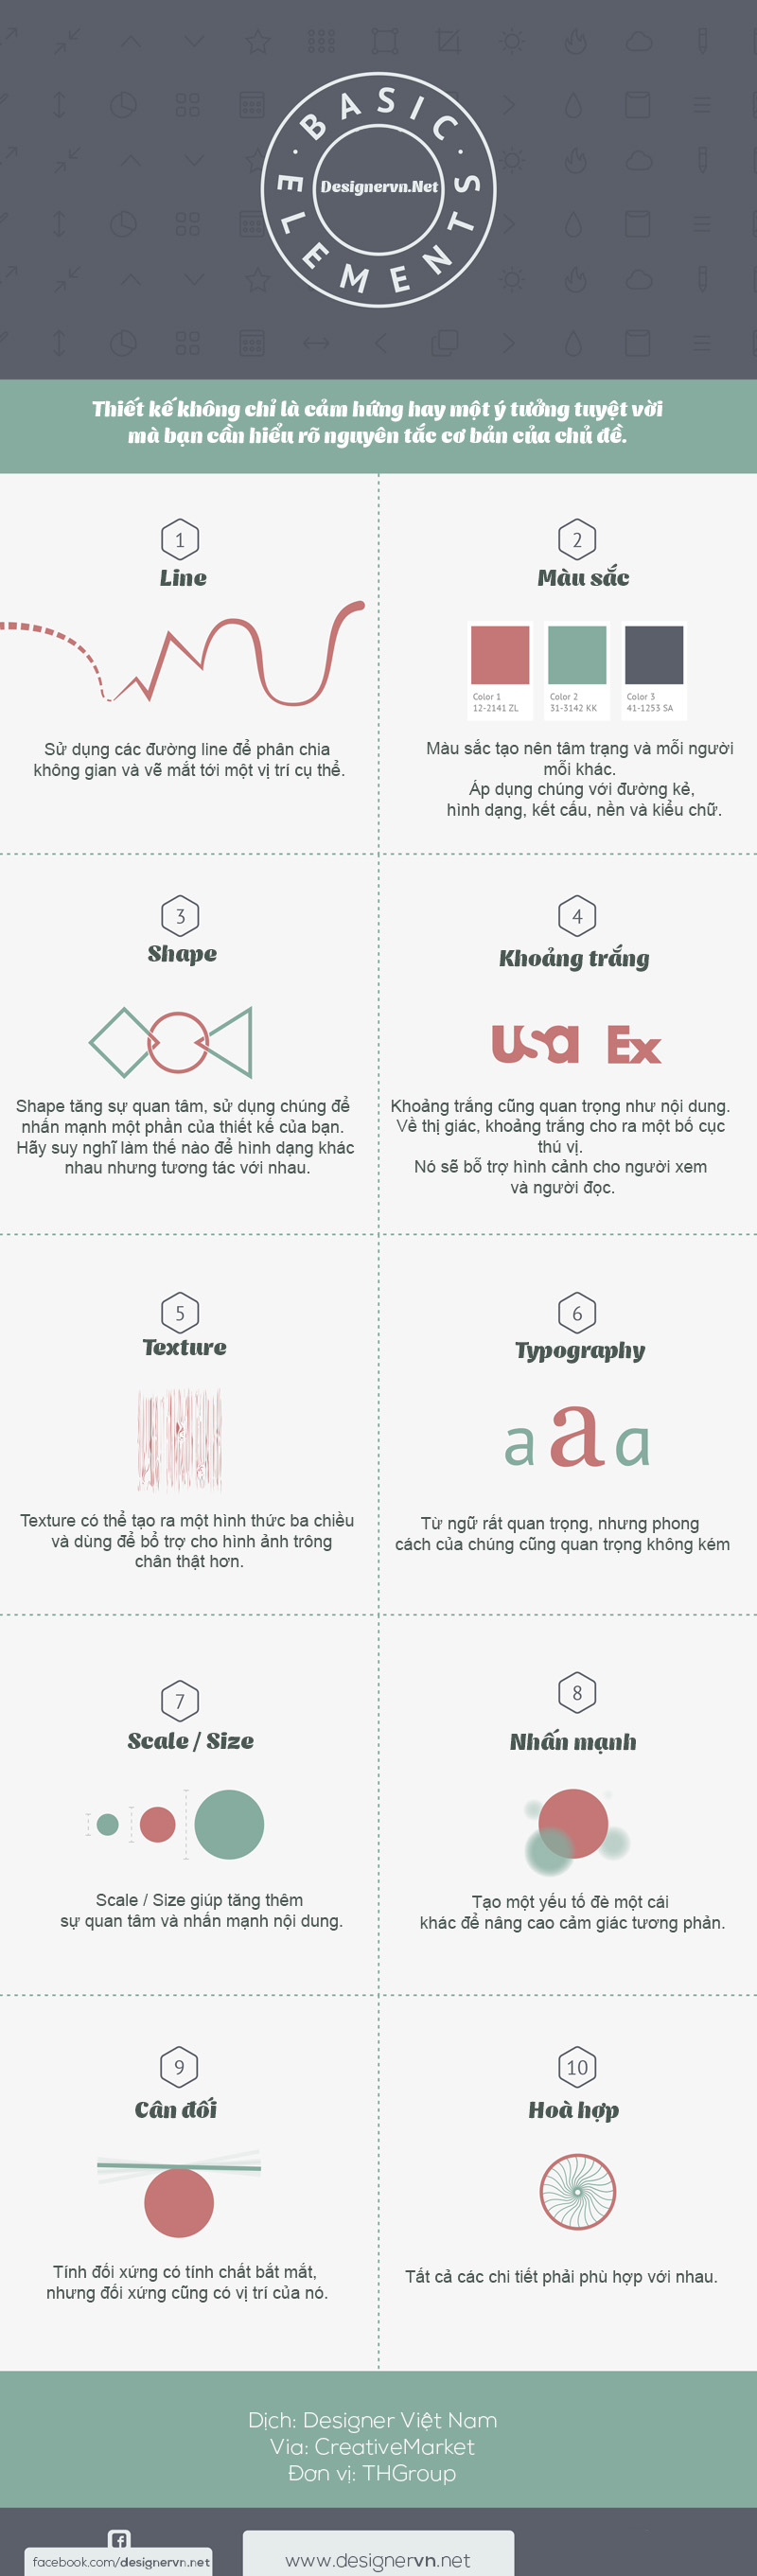 basic-elements-of-design.